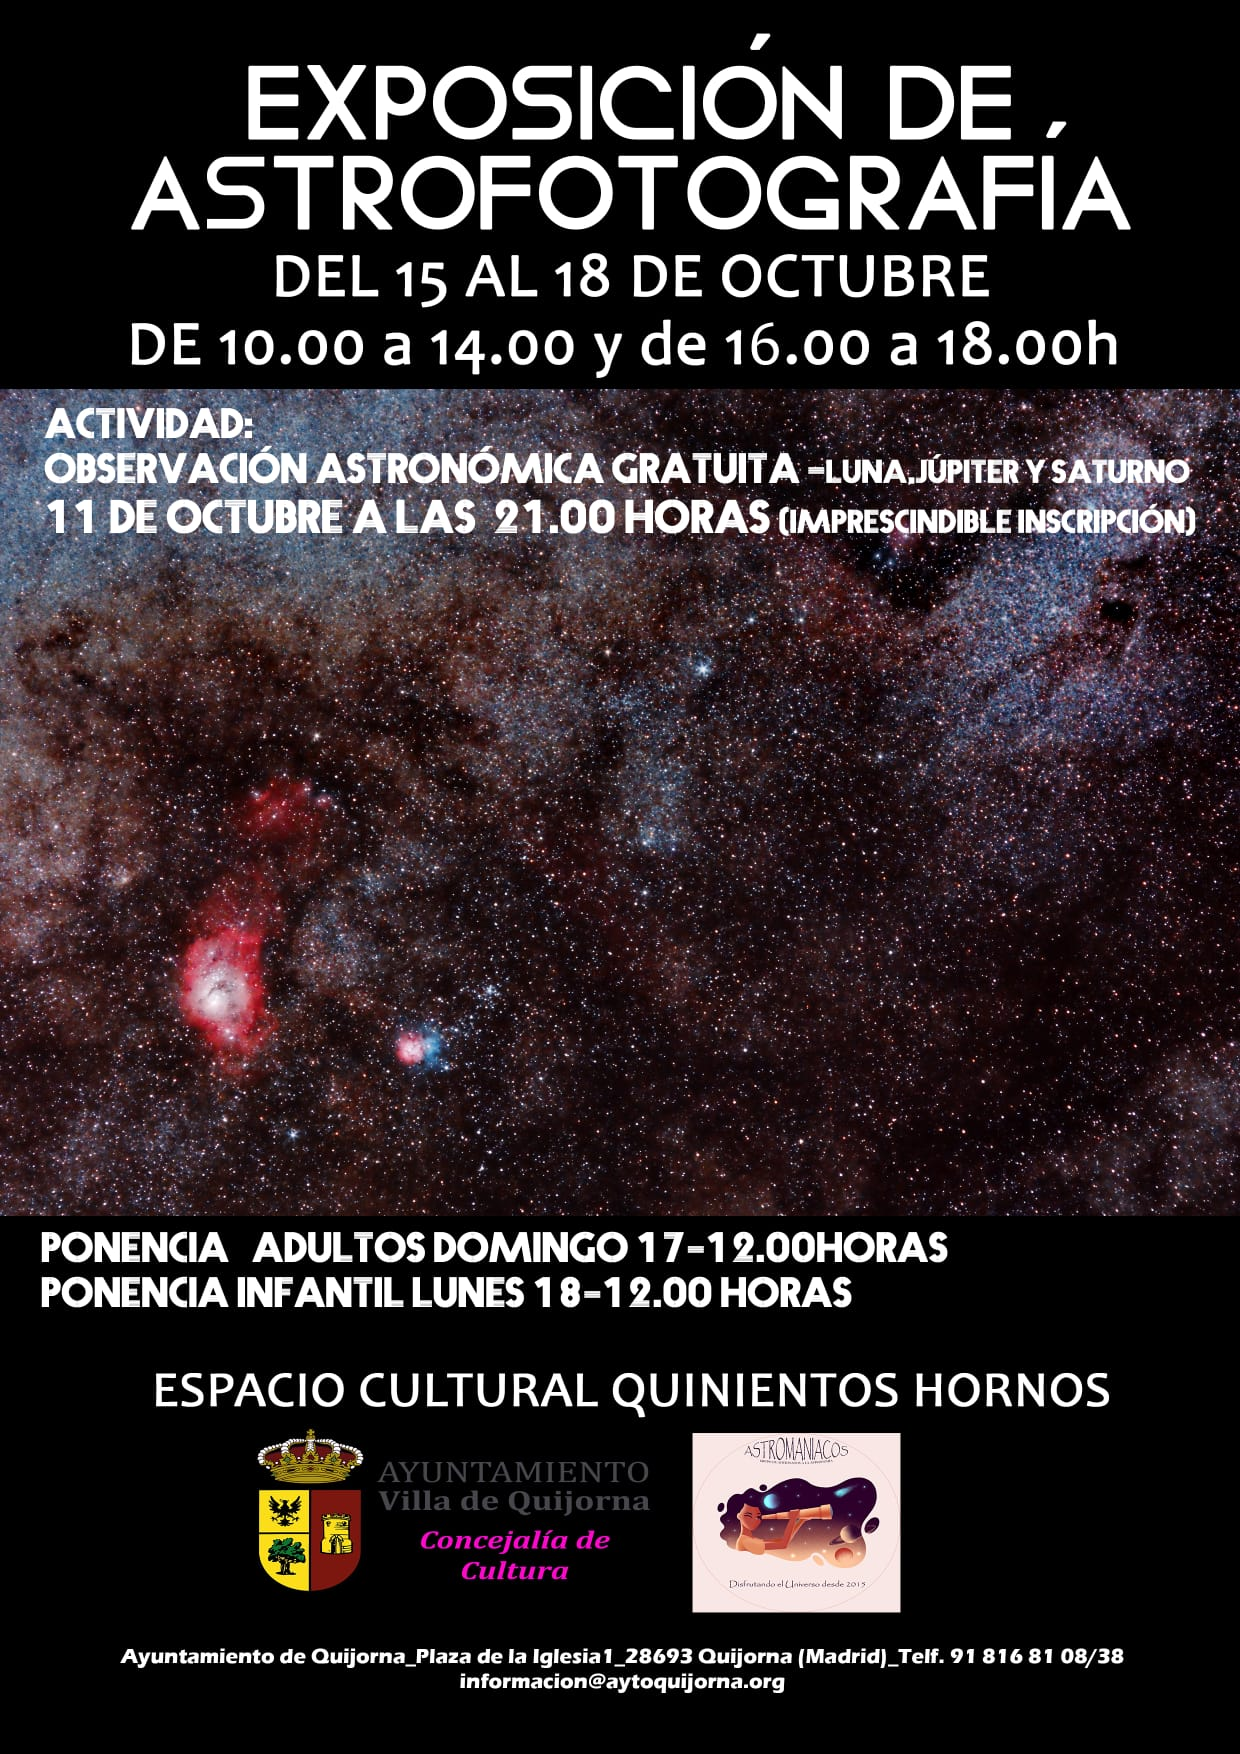 Exposición de astrofotografía en Quijorna